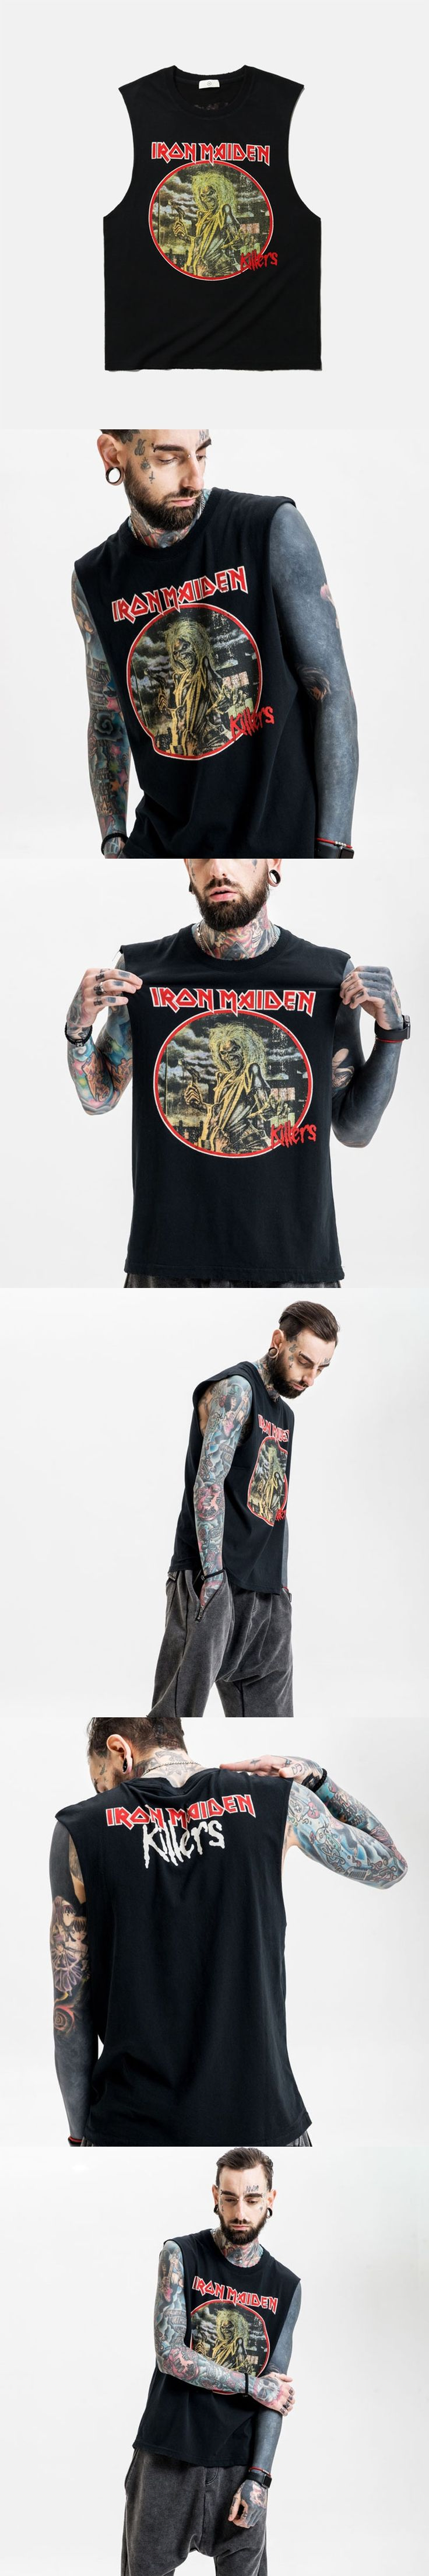 2017 New Product Iron Lady Band Wear Acid Rock Joker Vest   T